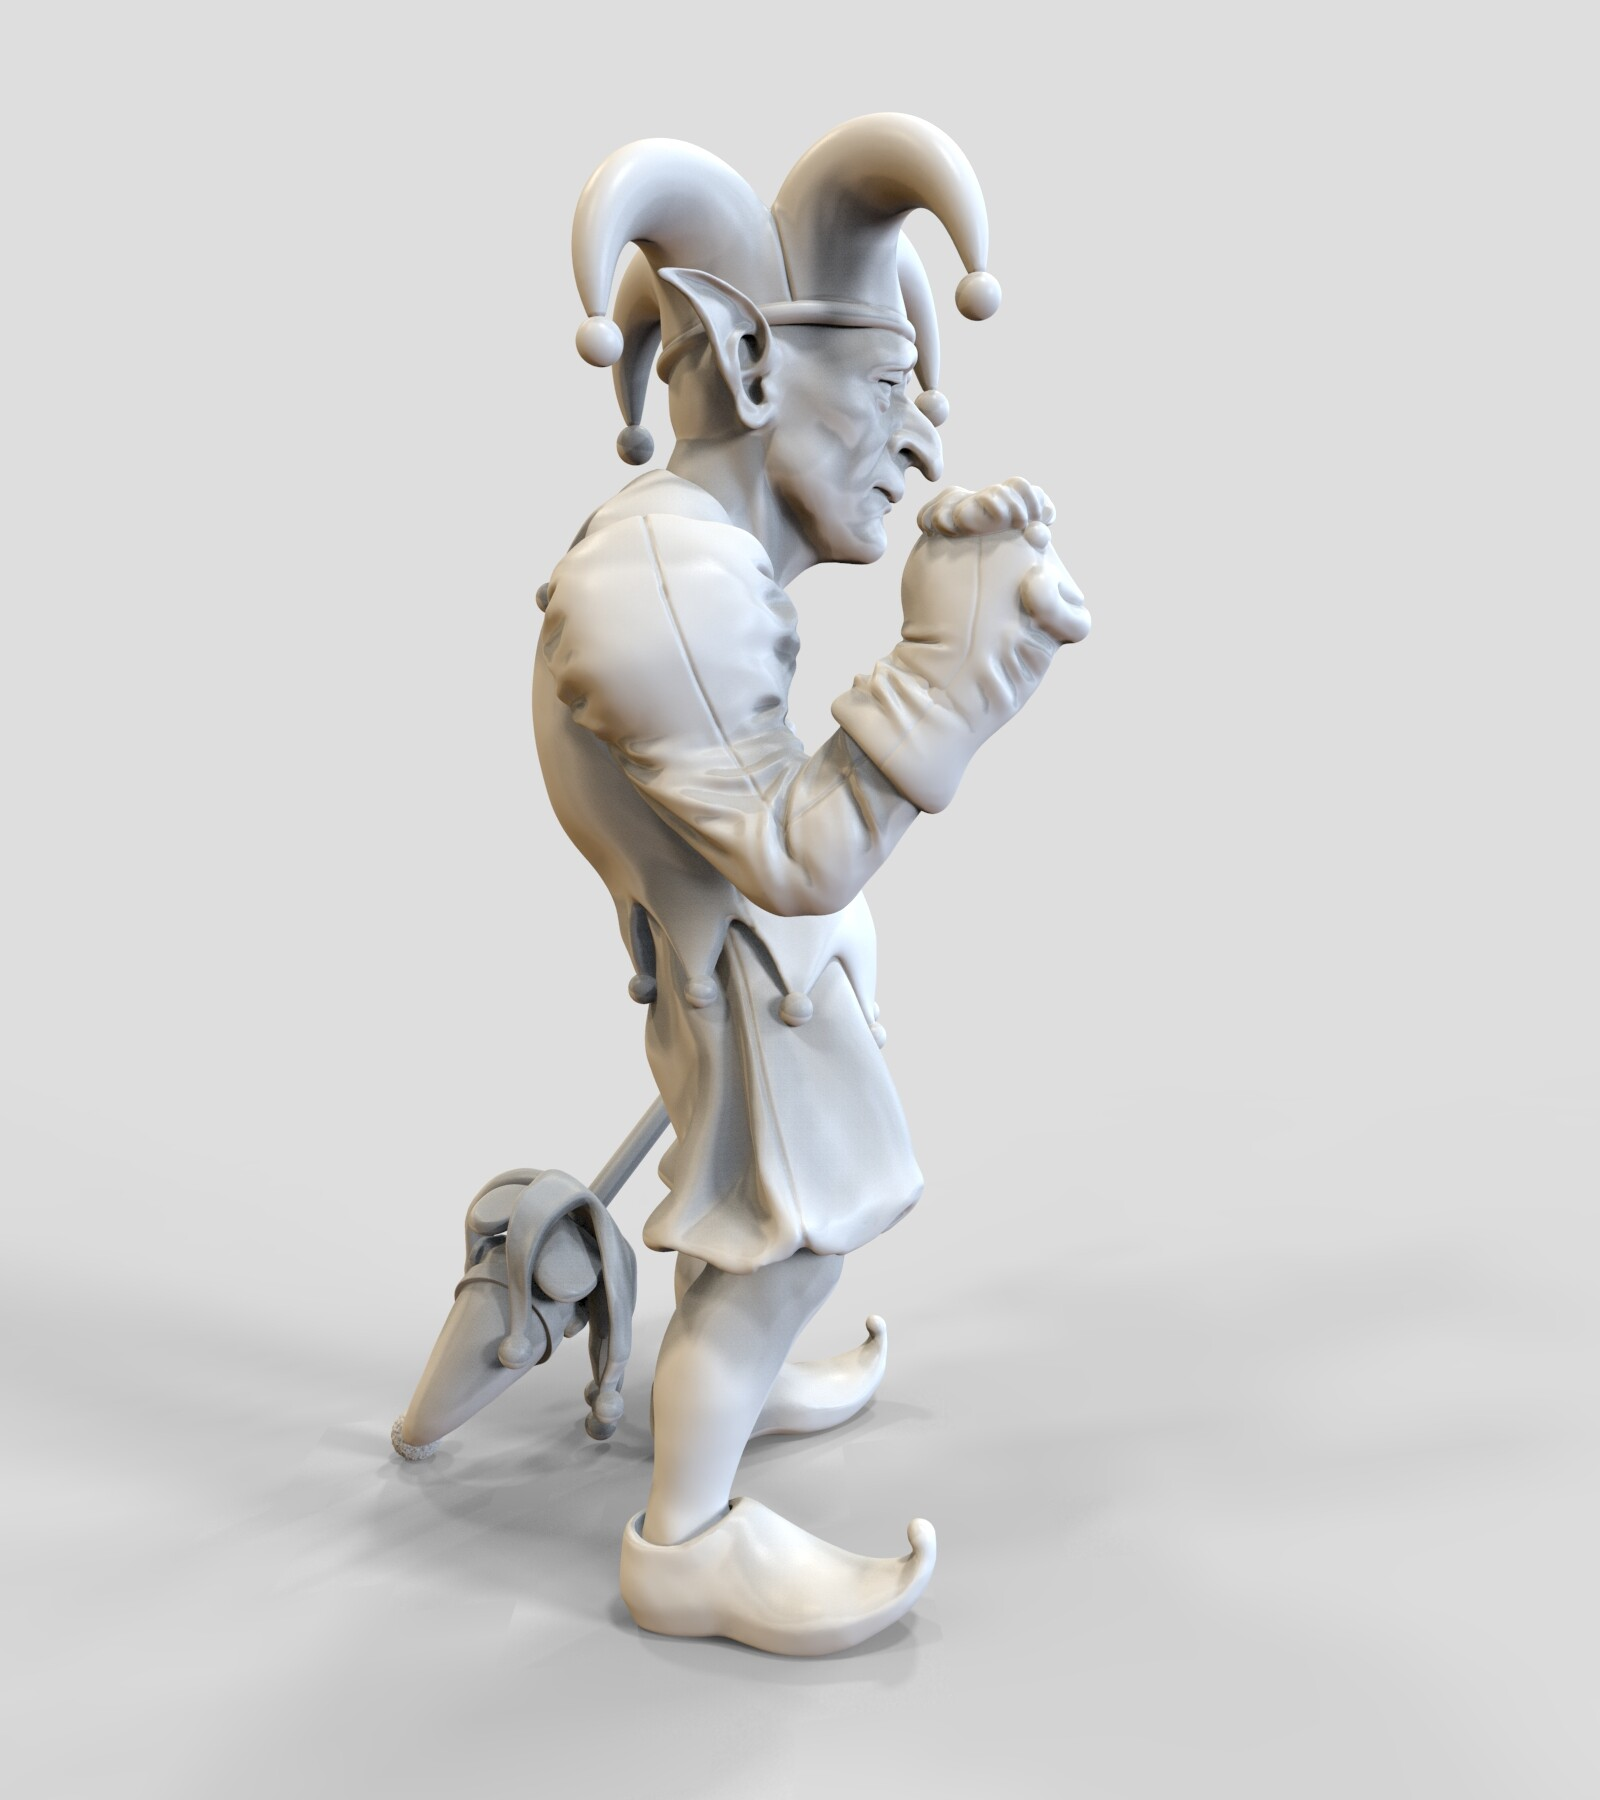 Andre de souza goblin jester 8